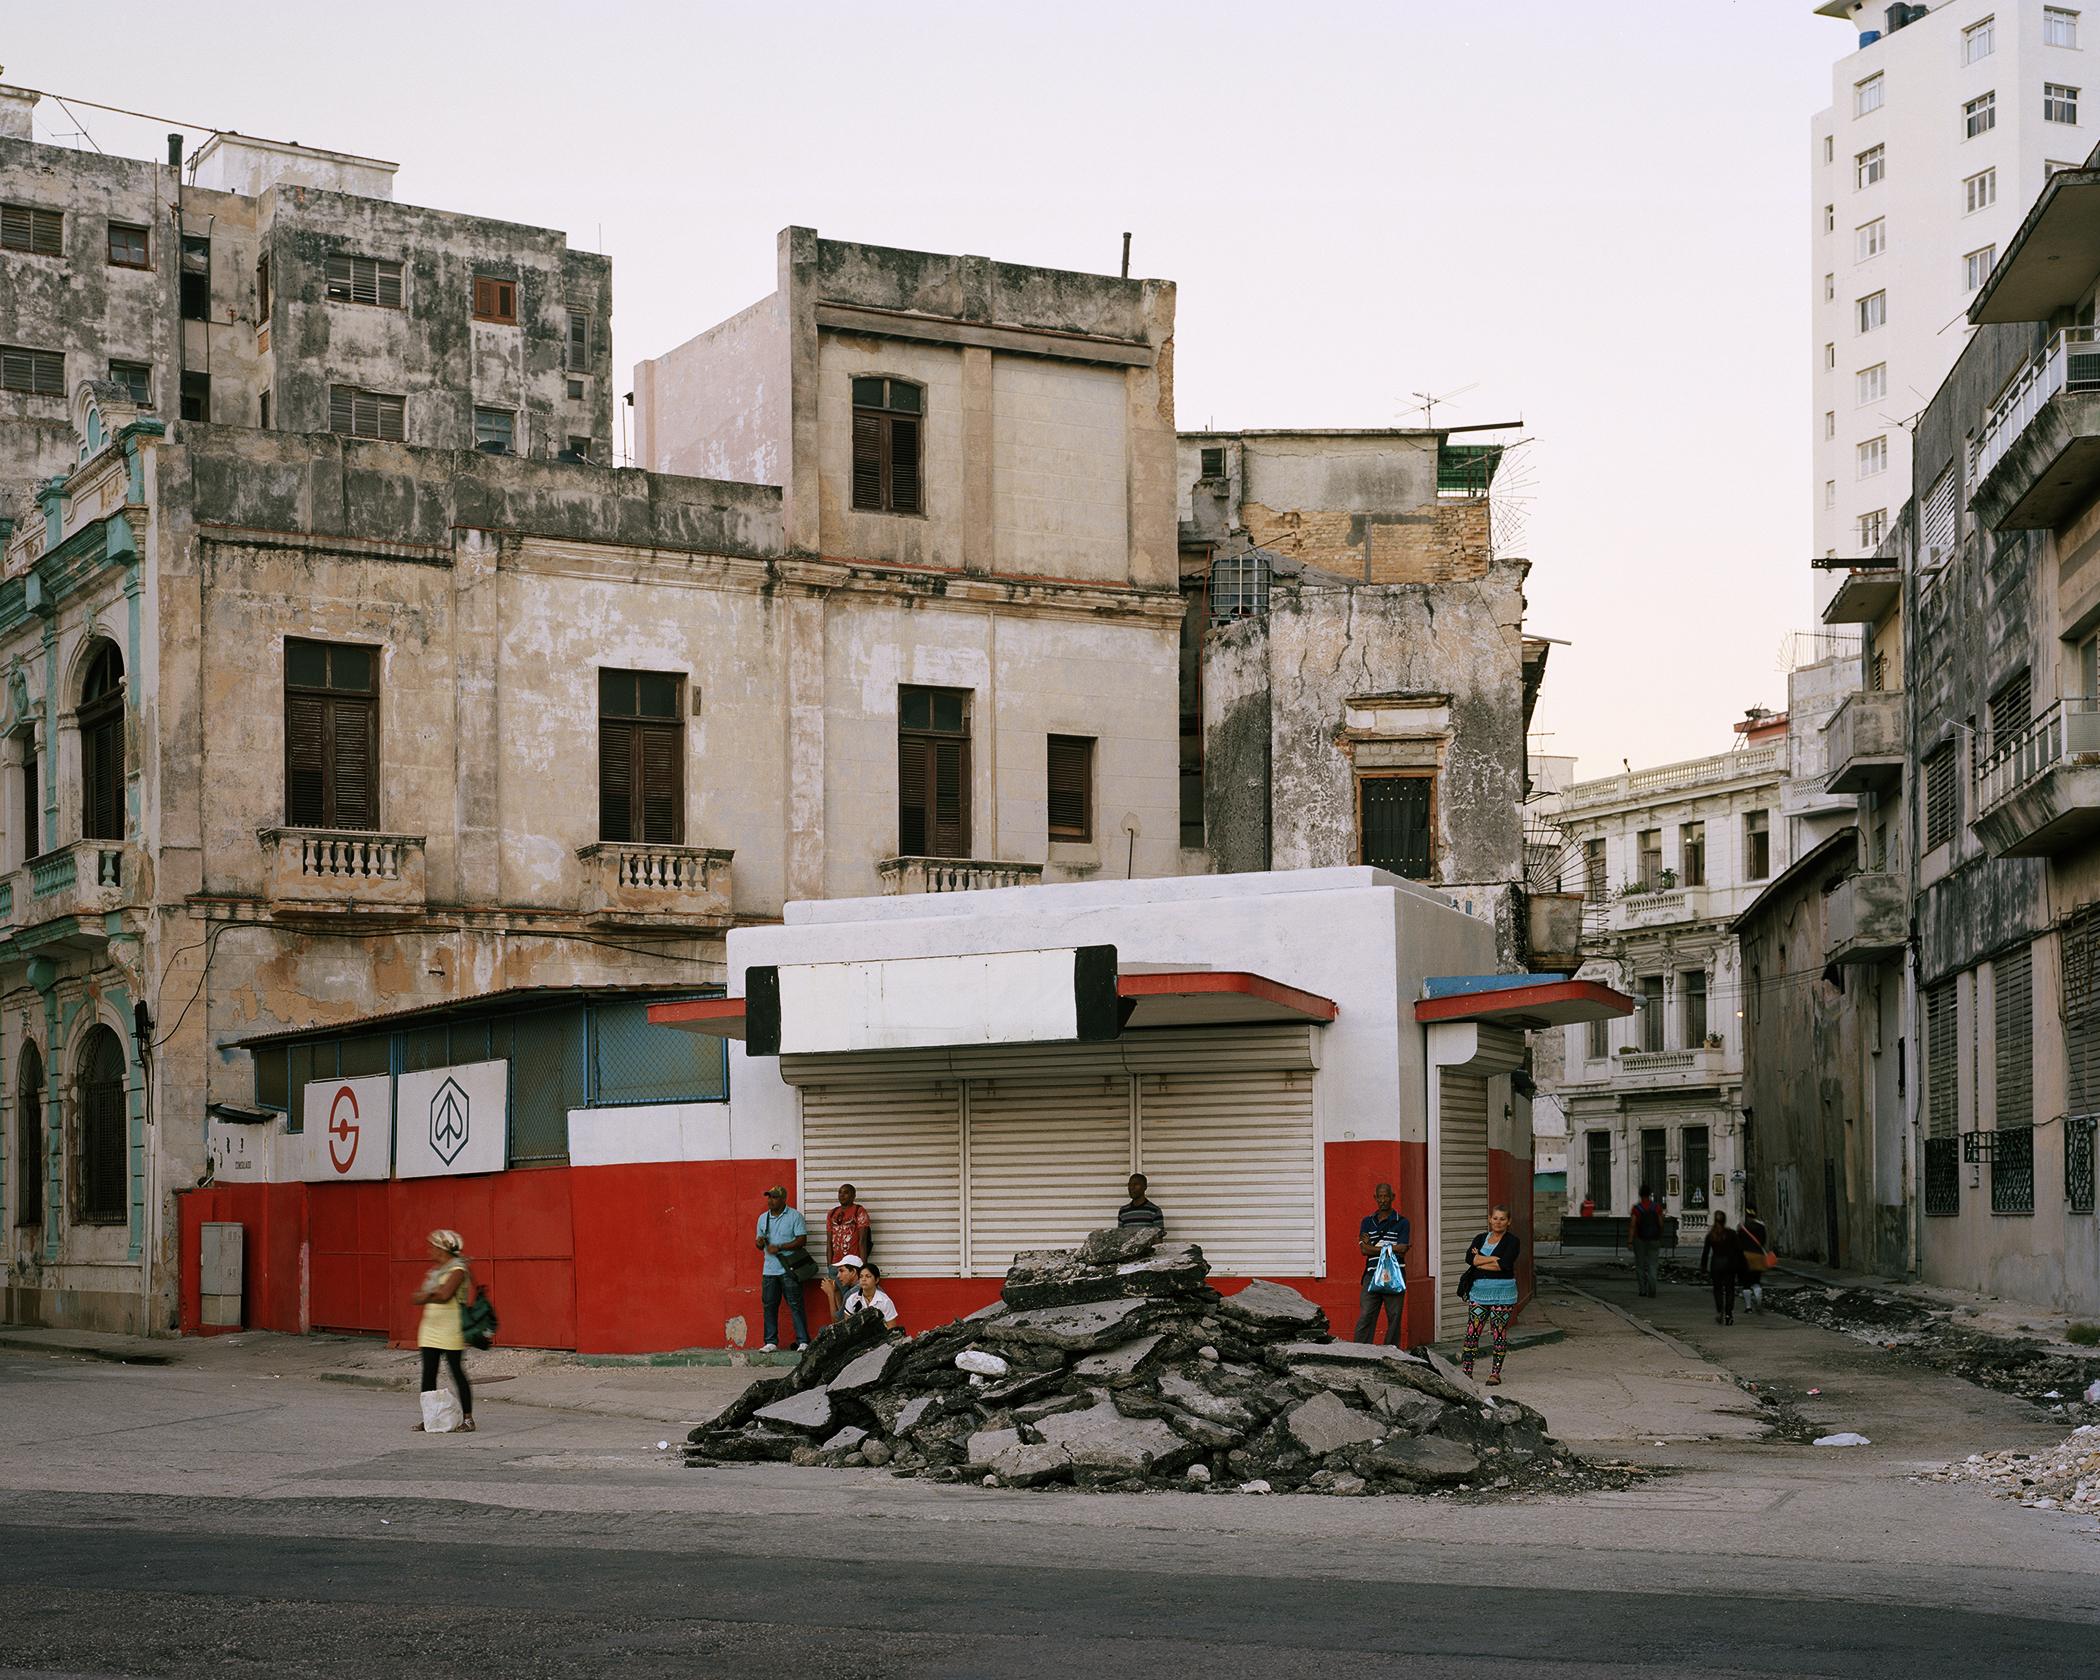 Waiting, Havana, Cuba, 2014  Large Format Color Photograph, Archival Inkjet Print  40 x 50 inches (101.6 x 127 cm)